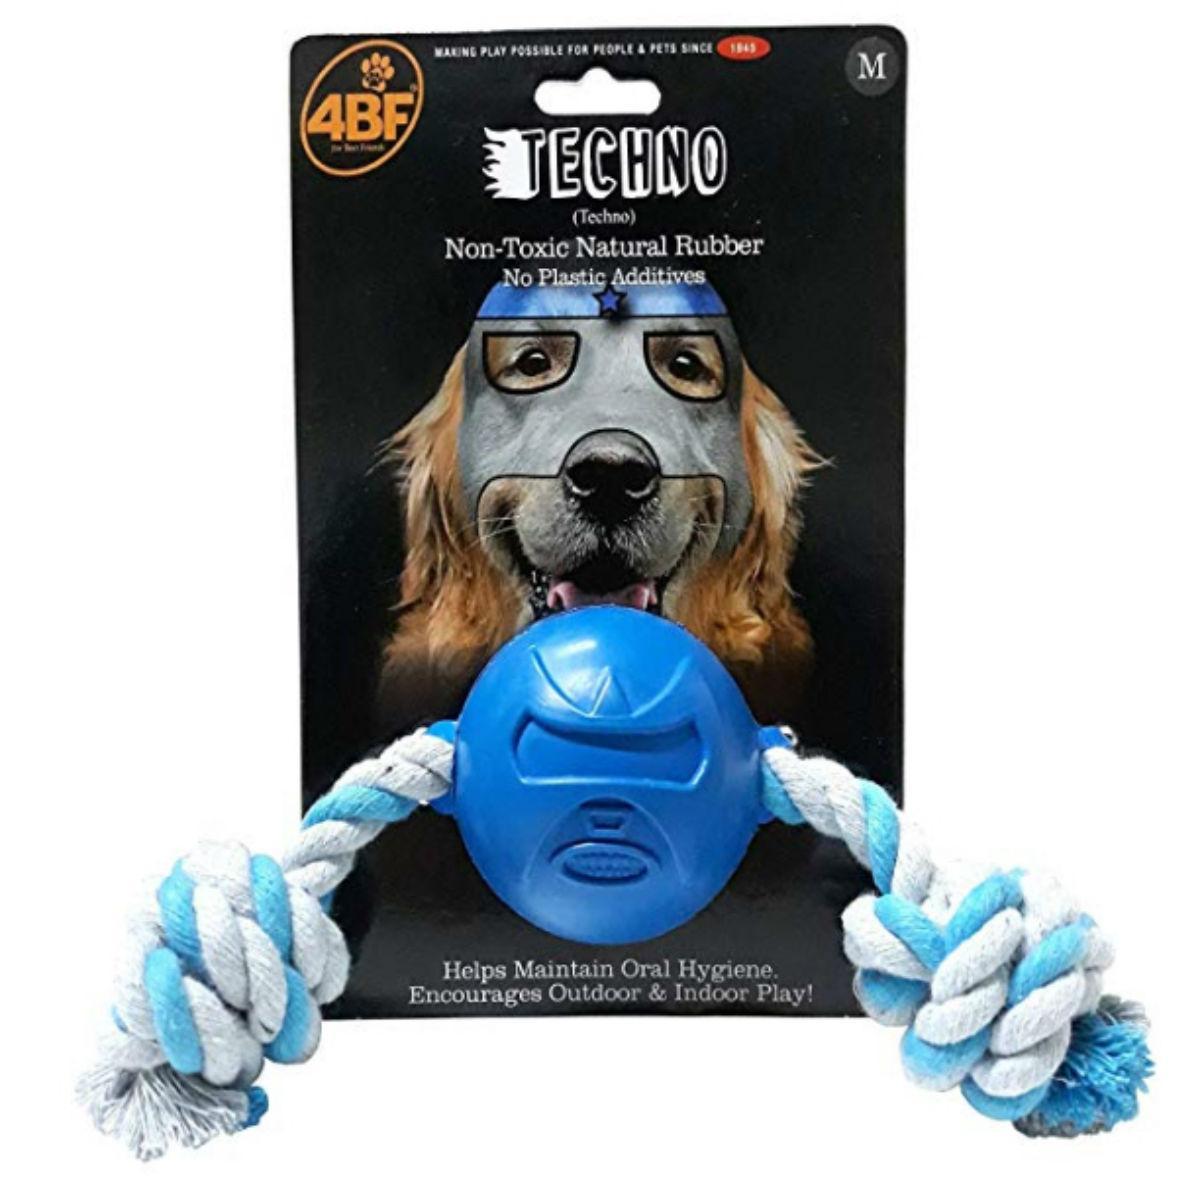 4BF Lucha Libre Mask Dog Toy - Techno